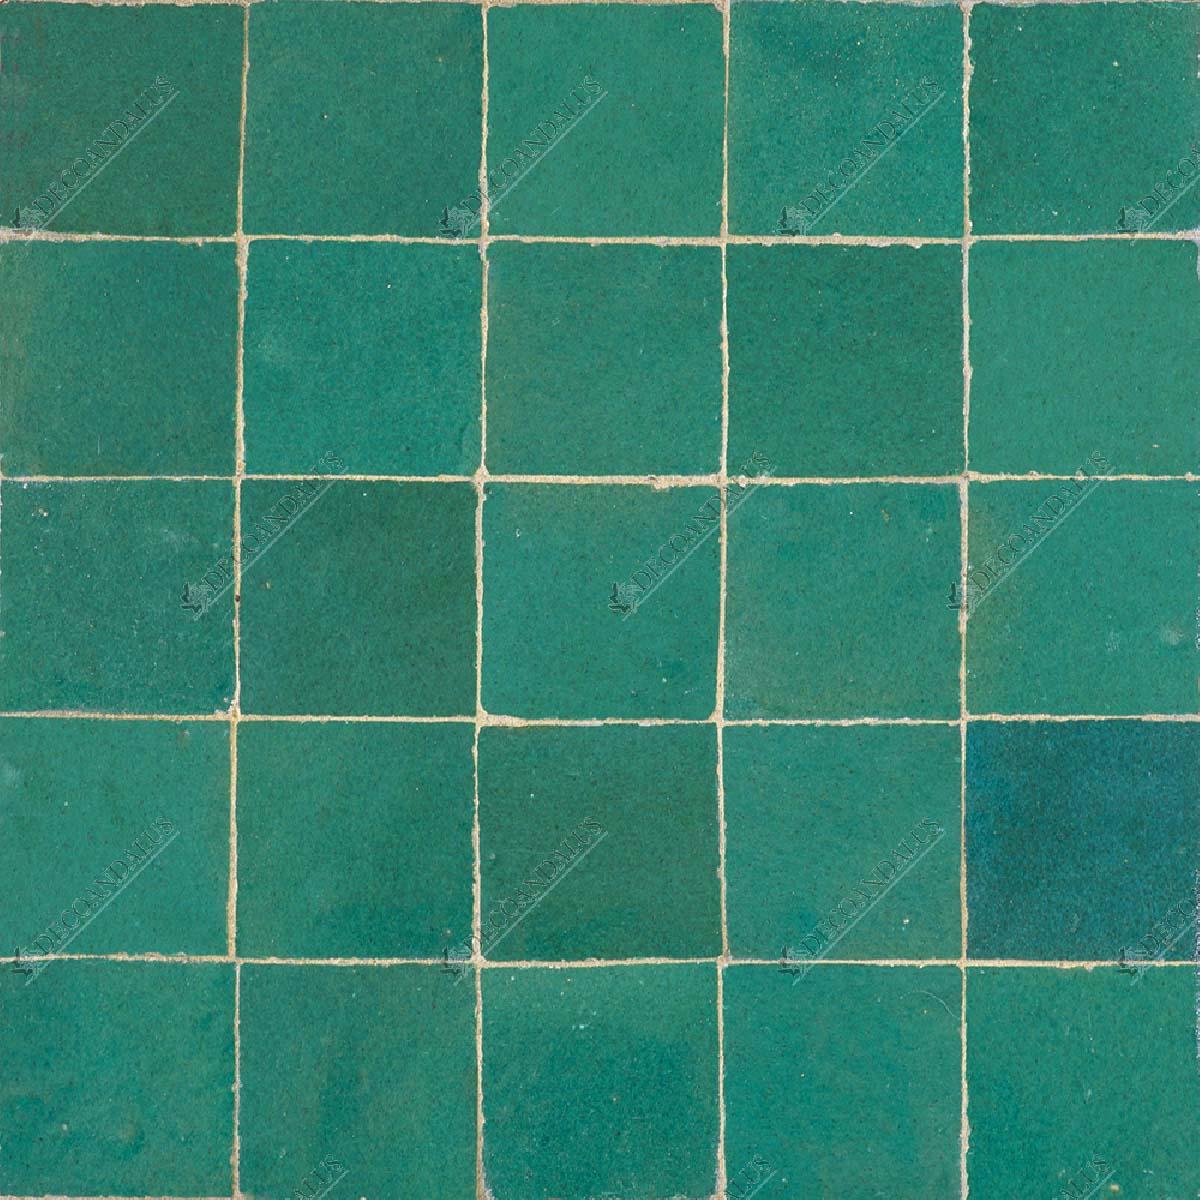 Mosaico AR.RF.3.2.52.0.1.02